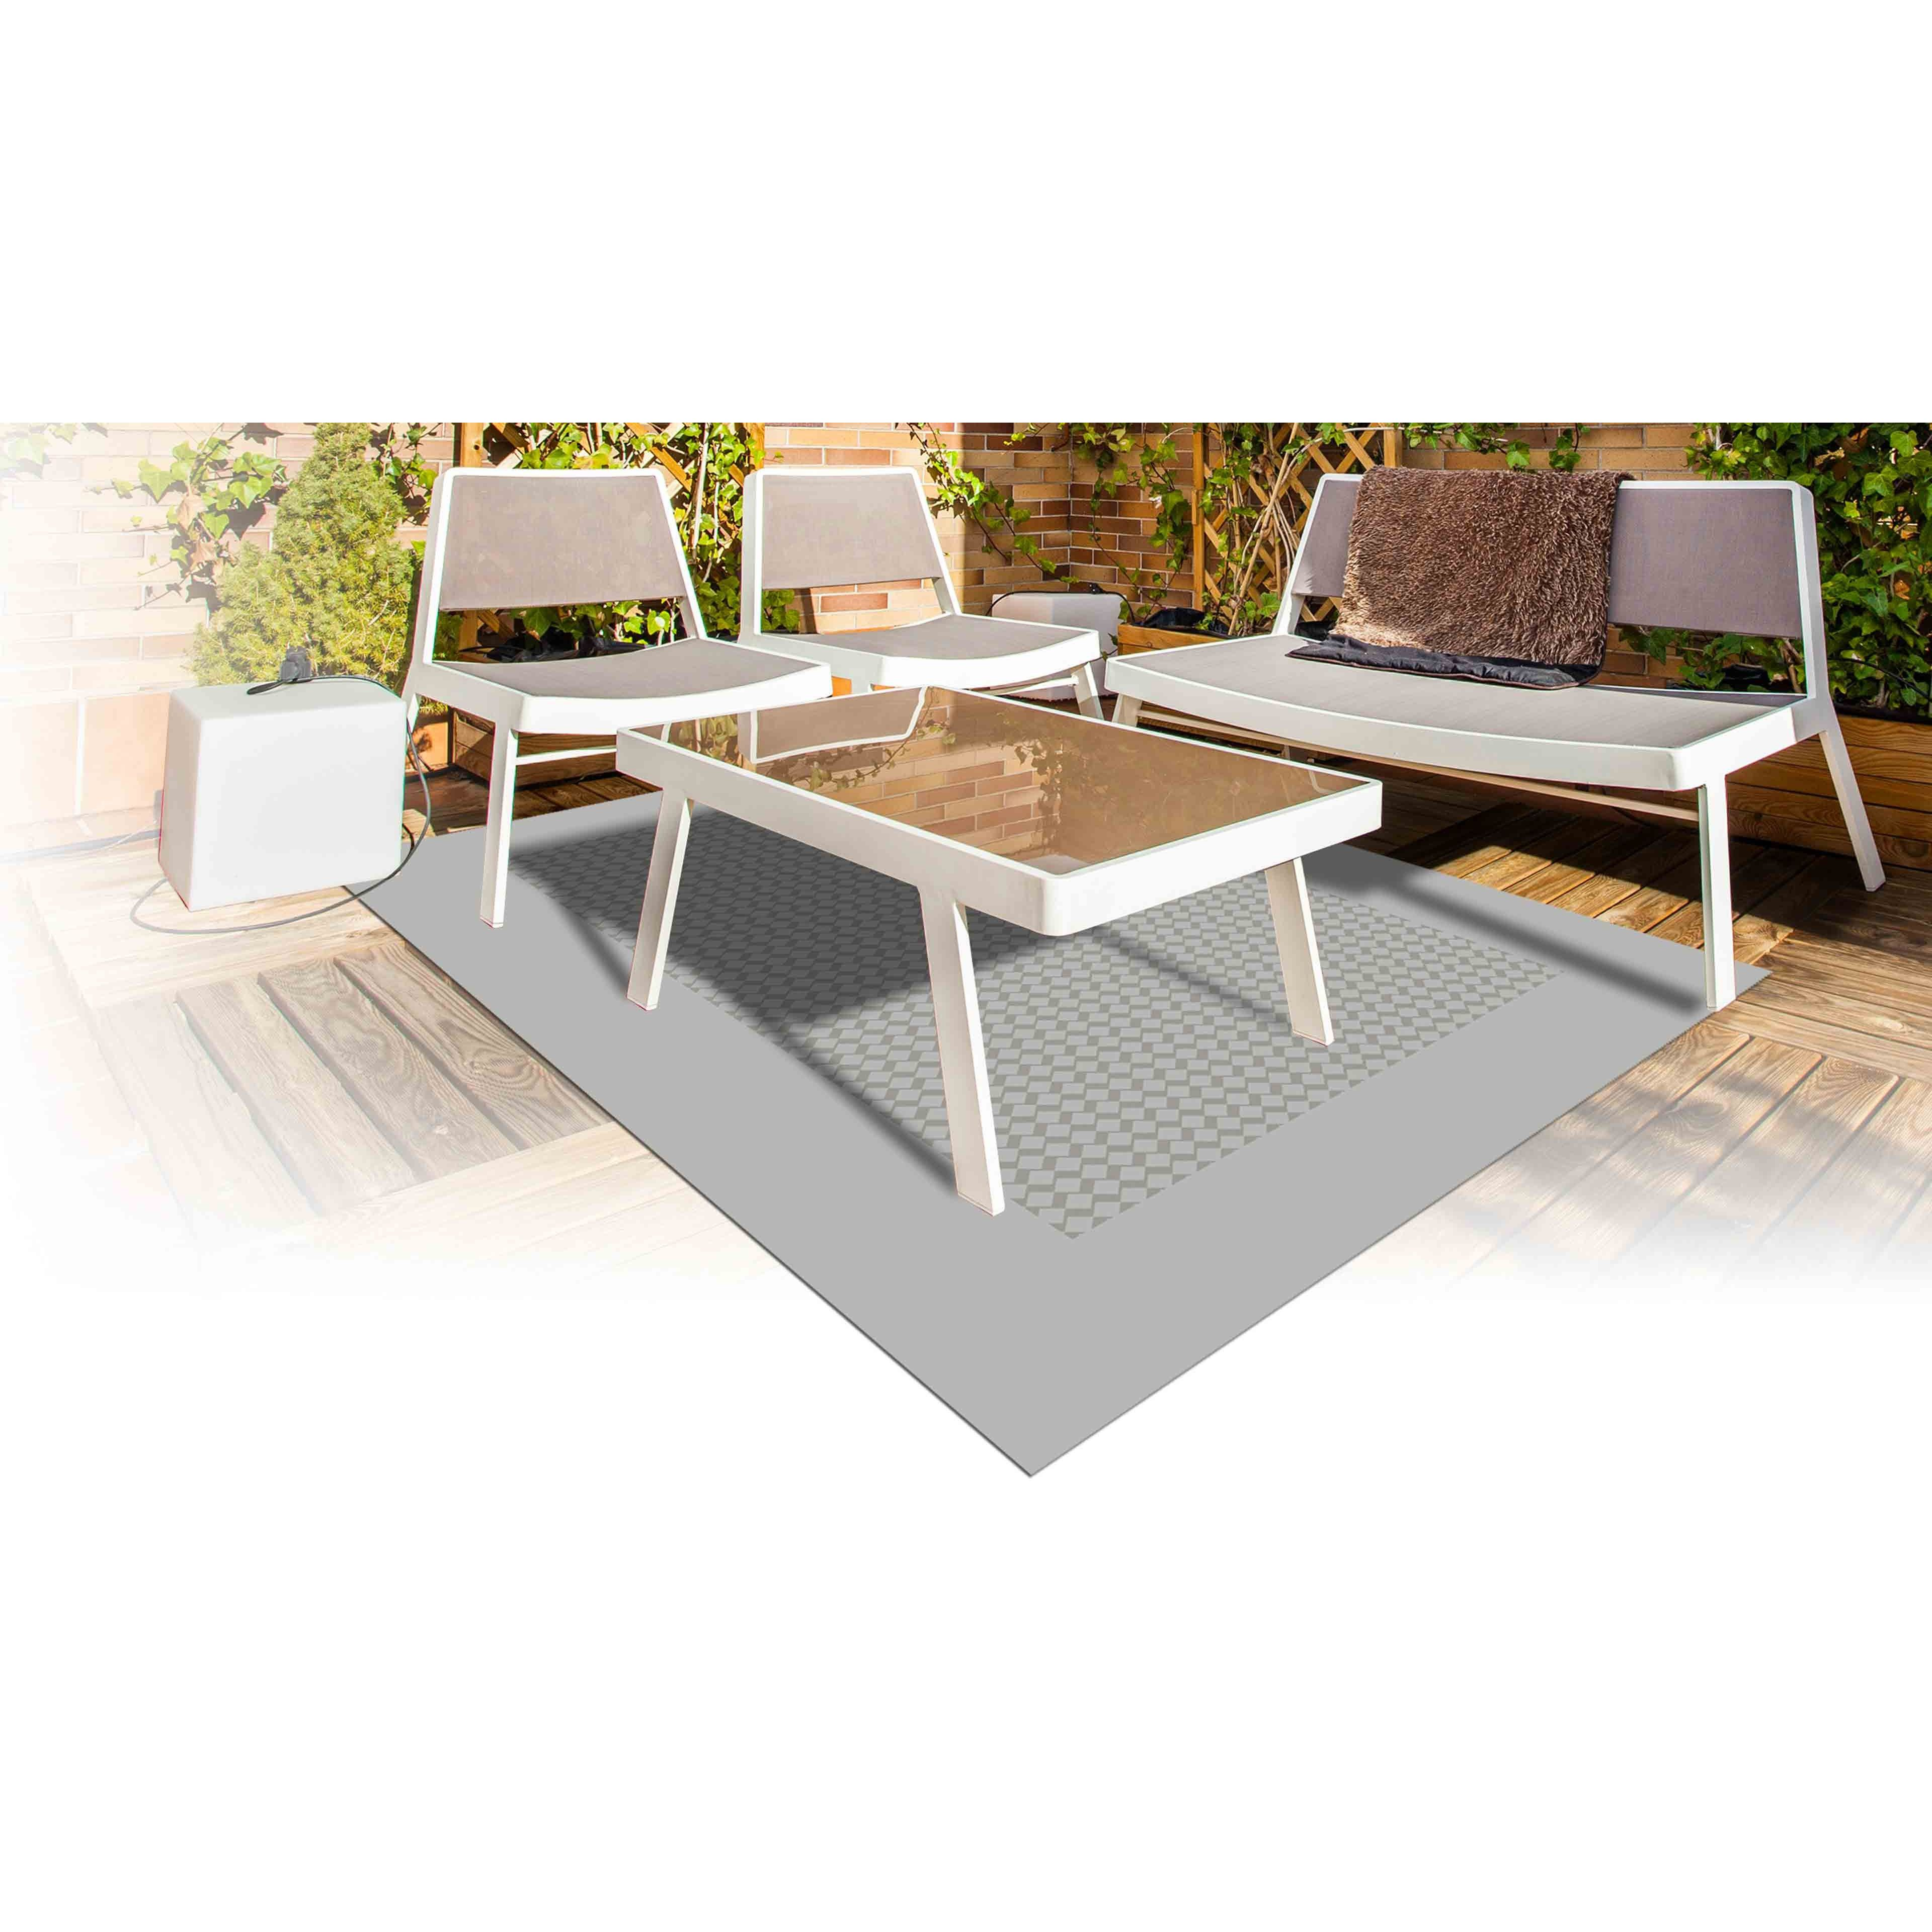 Tapis de terrasse en PVC | Solys